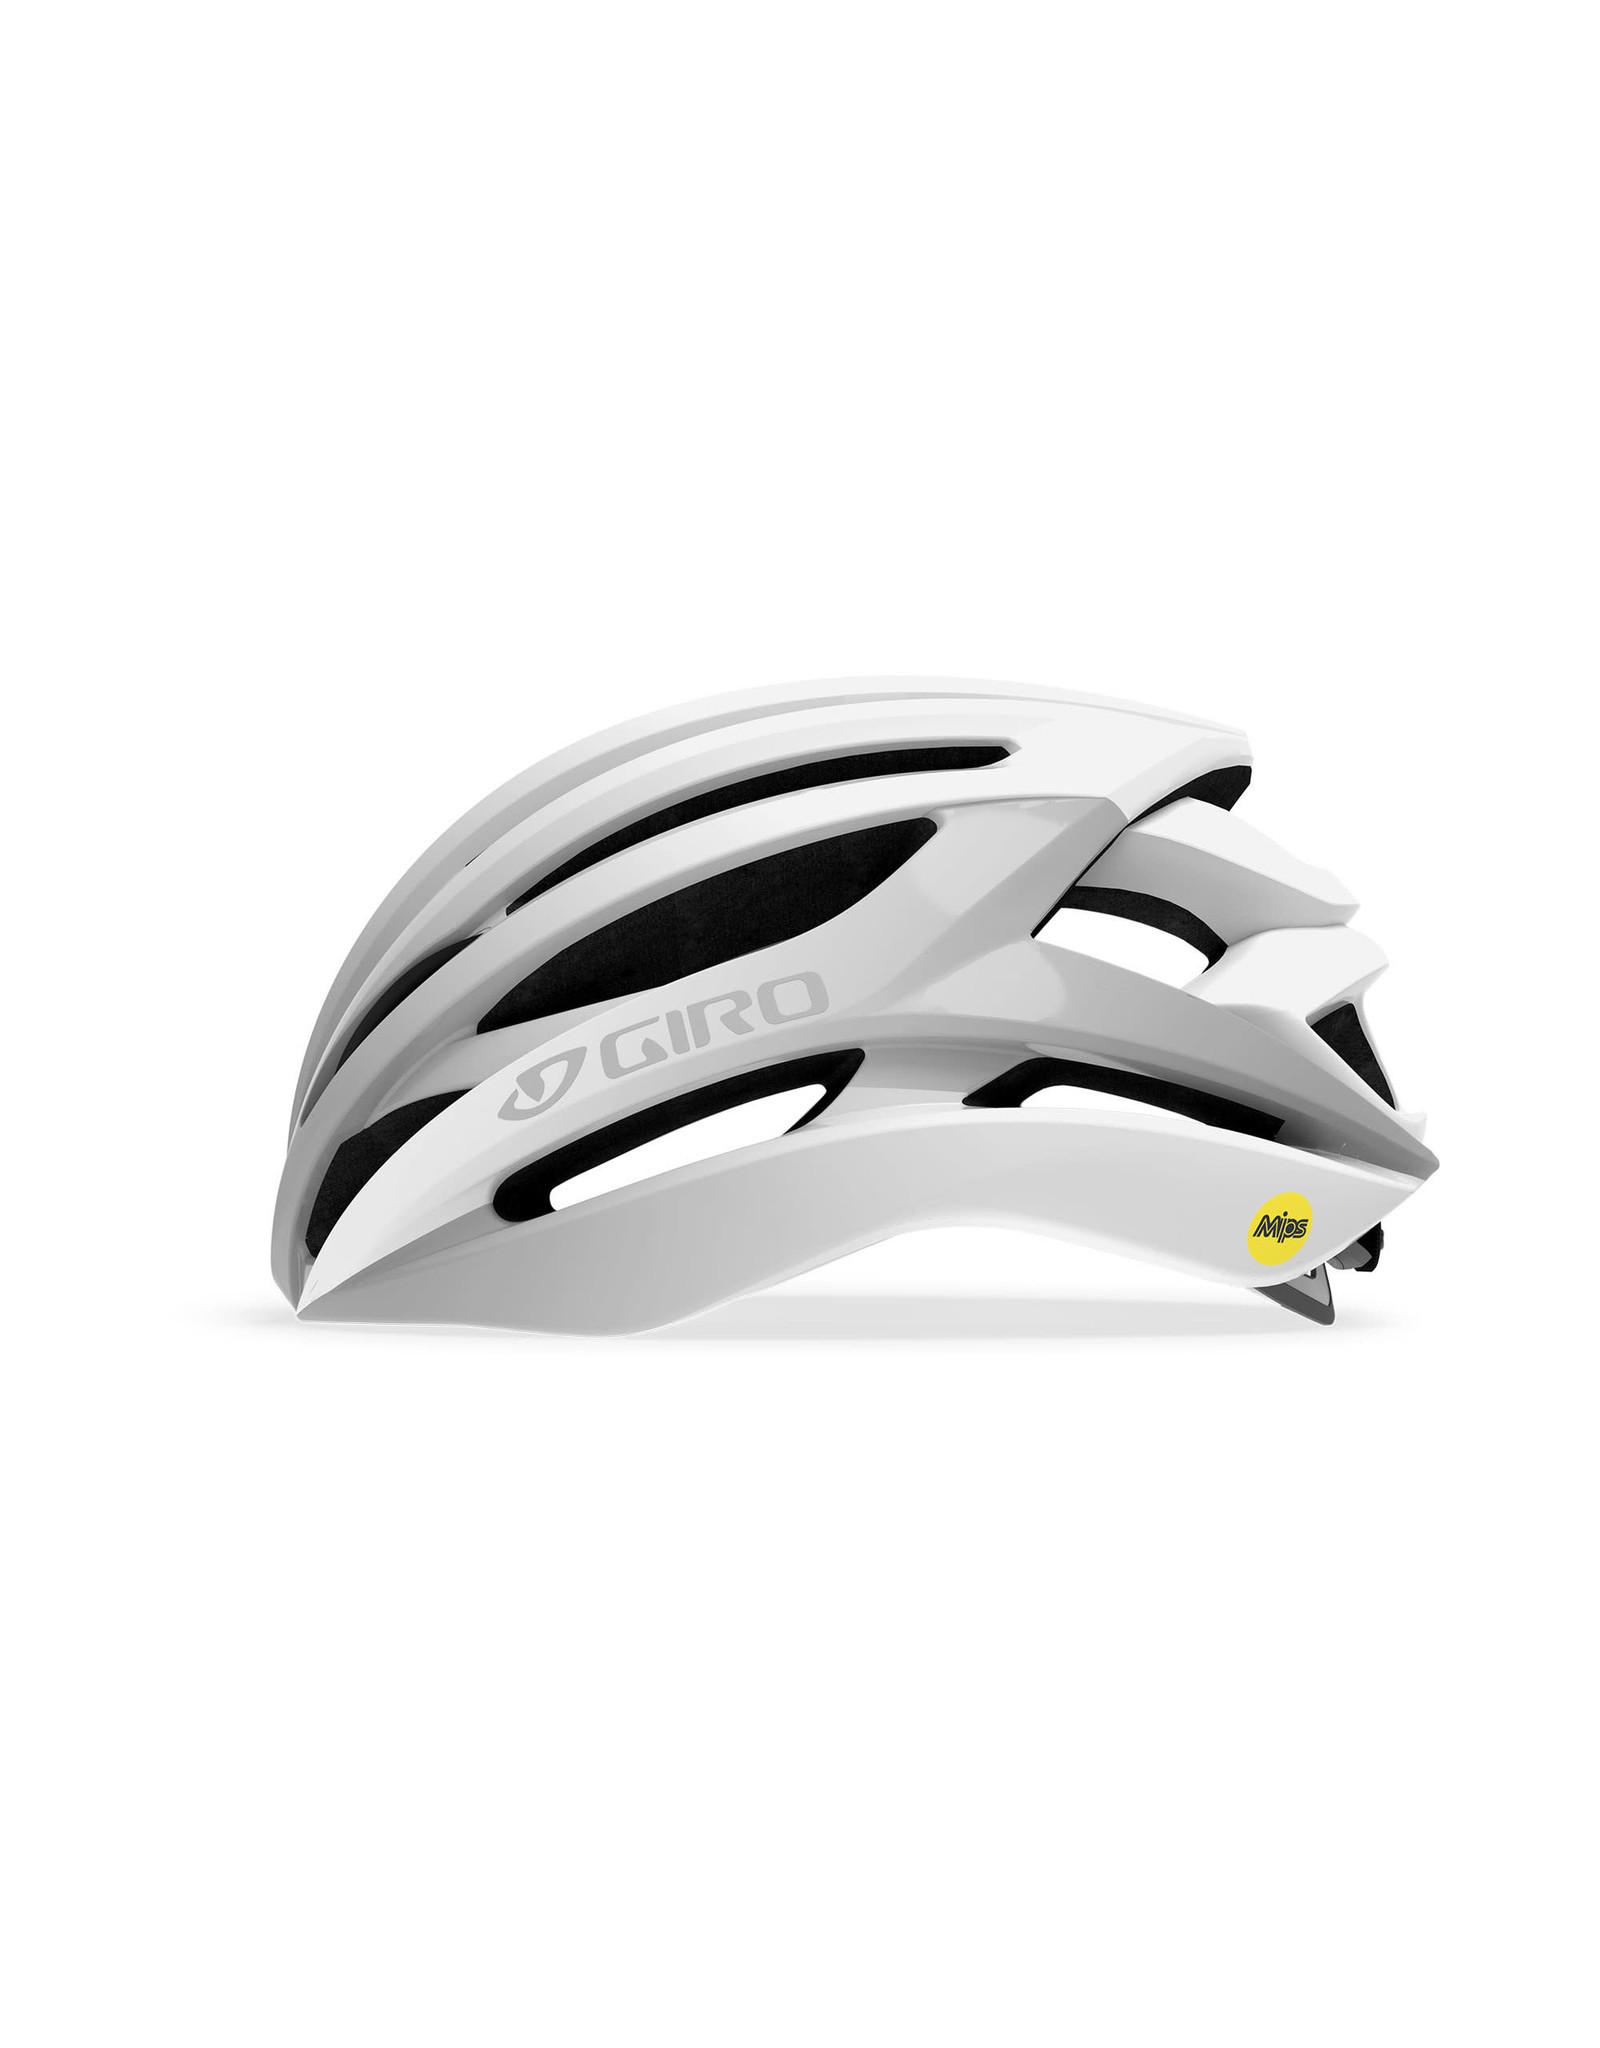 Giro Cycling Giro Syntax MIPS Adult Road Bike Helmet - Matte White/Silver - Size XL (61-65 cm)